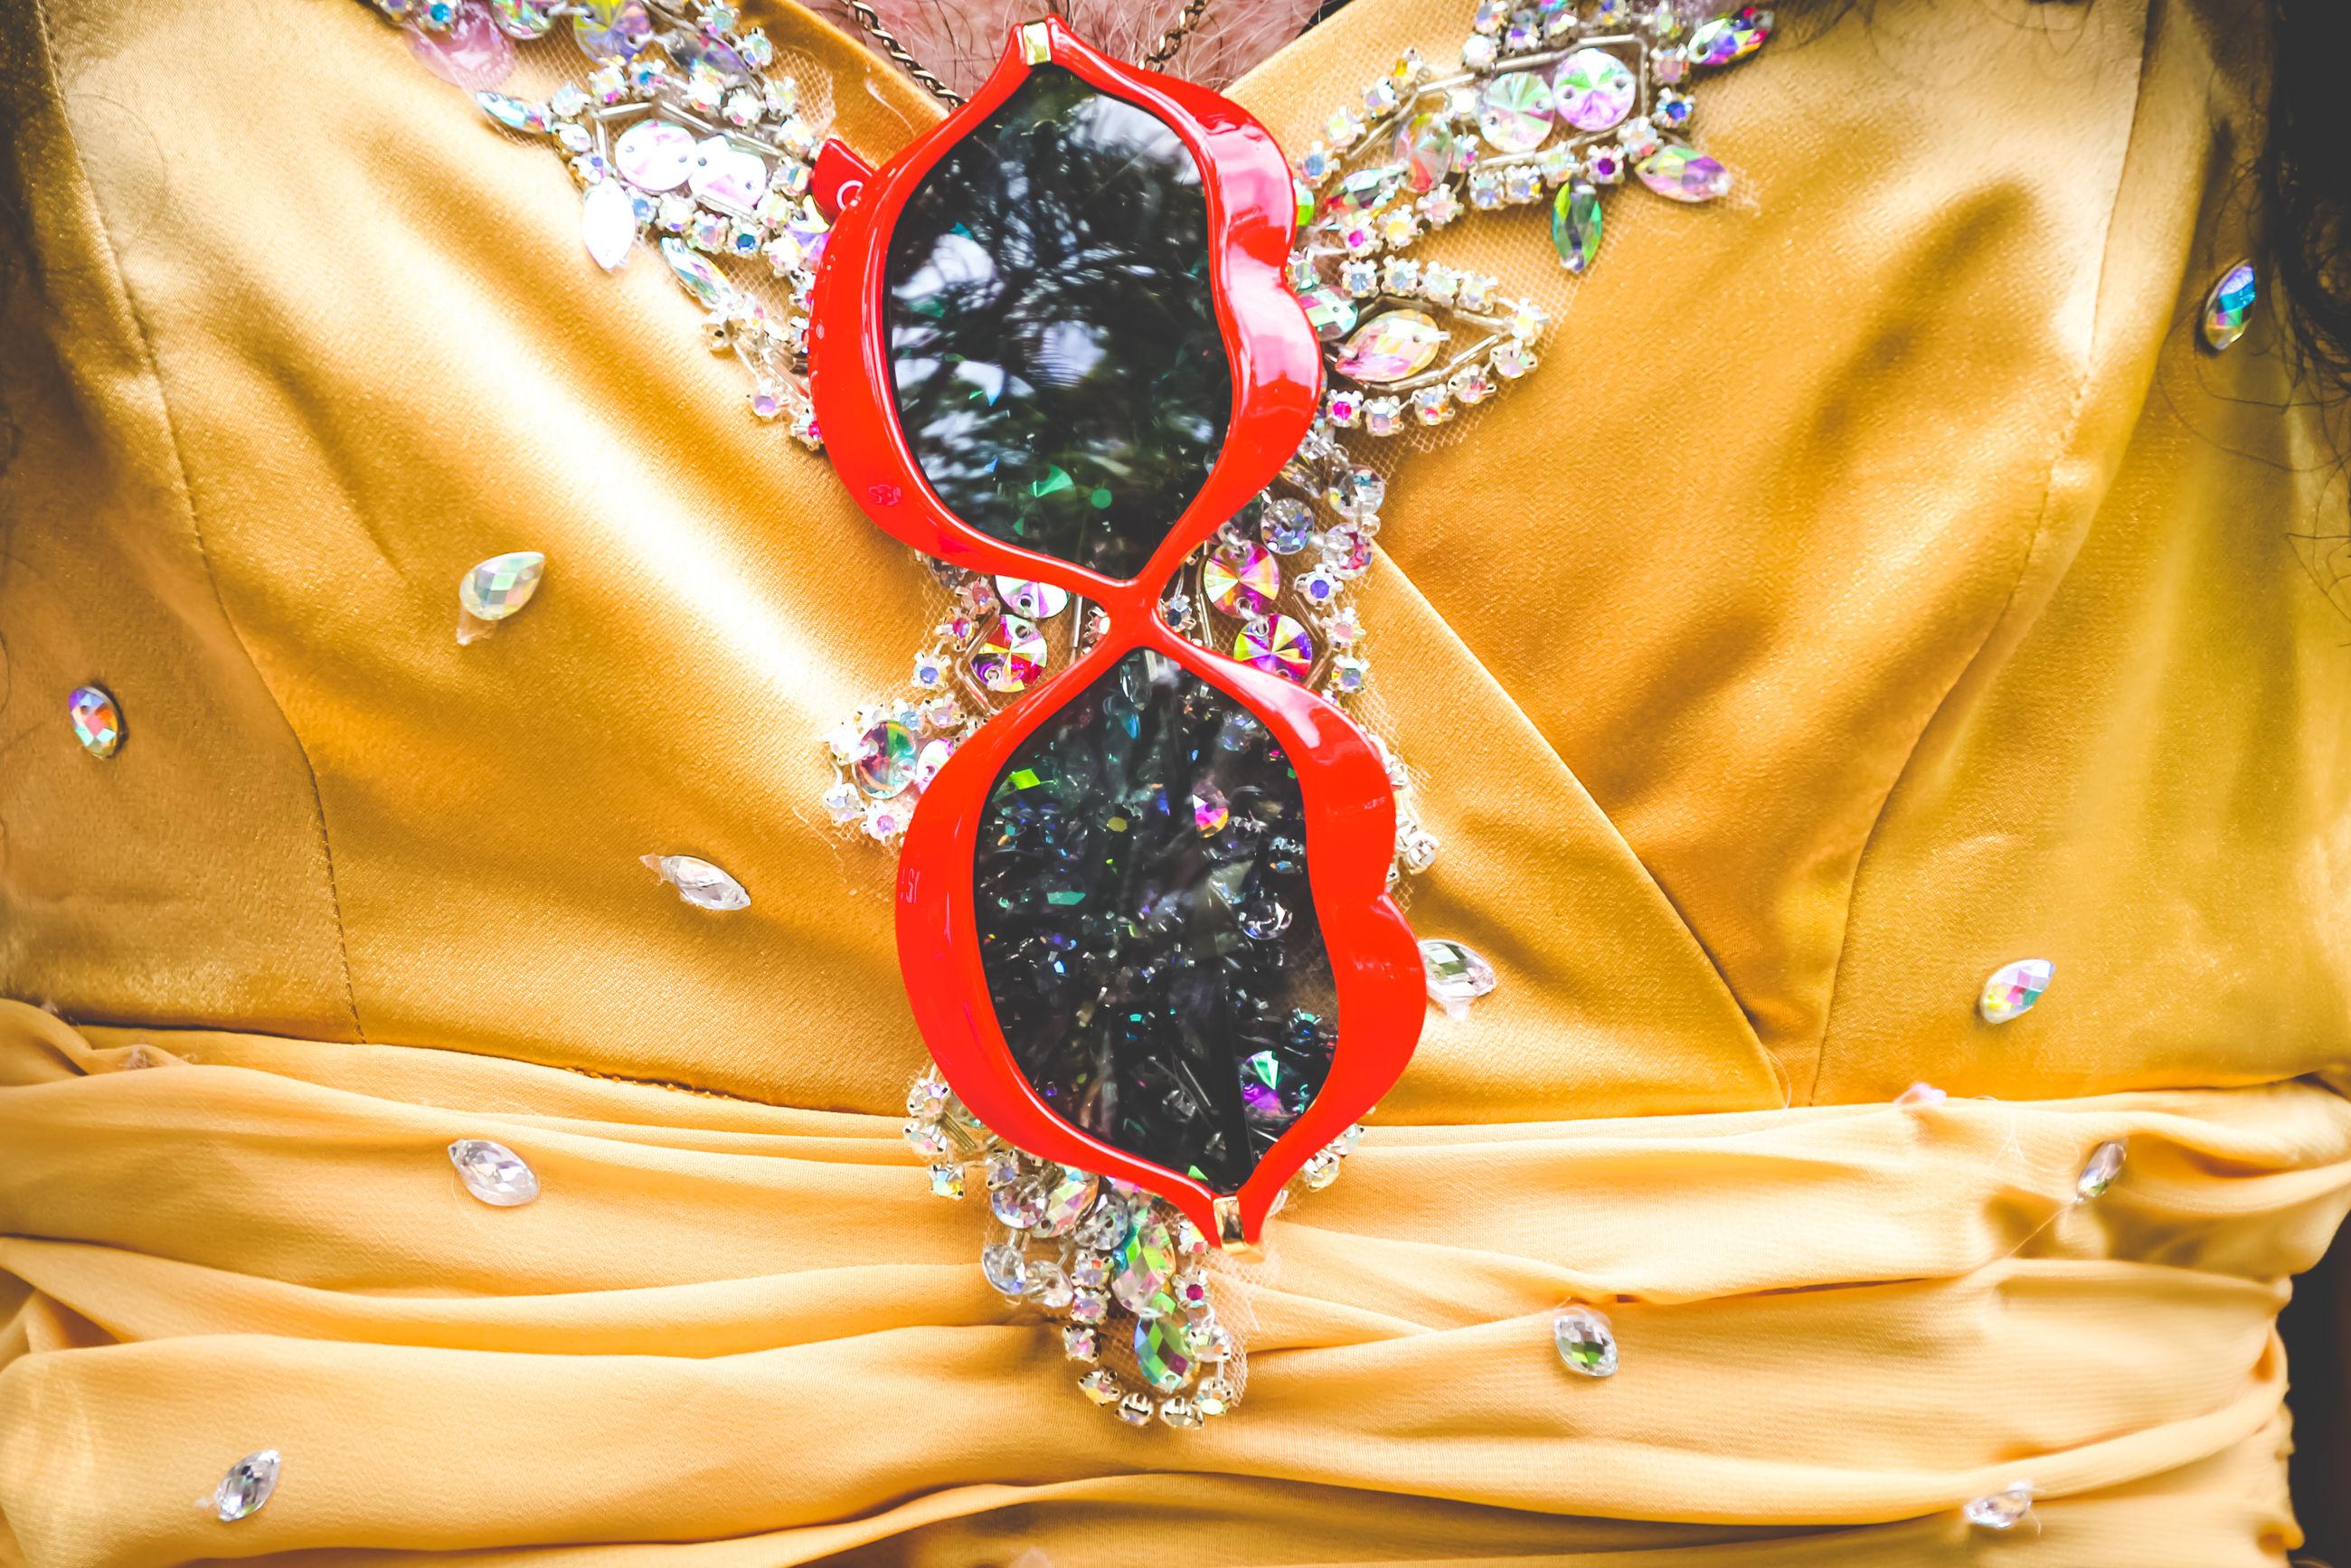 Close-up of sunglasses on dress